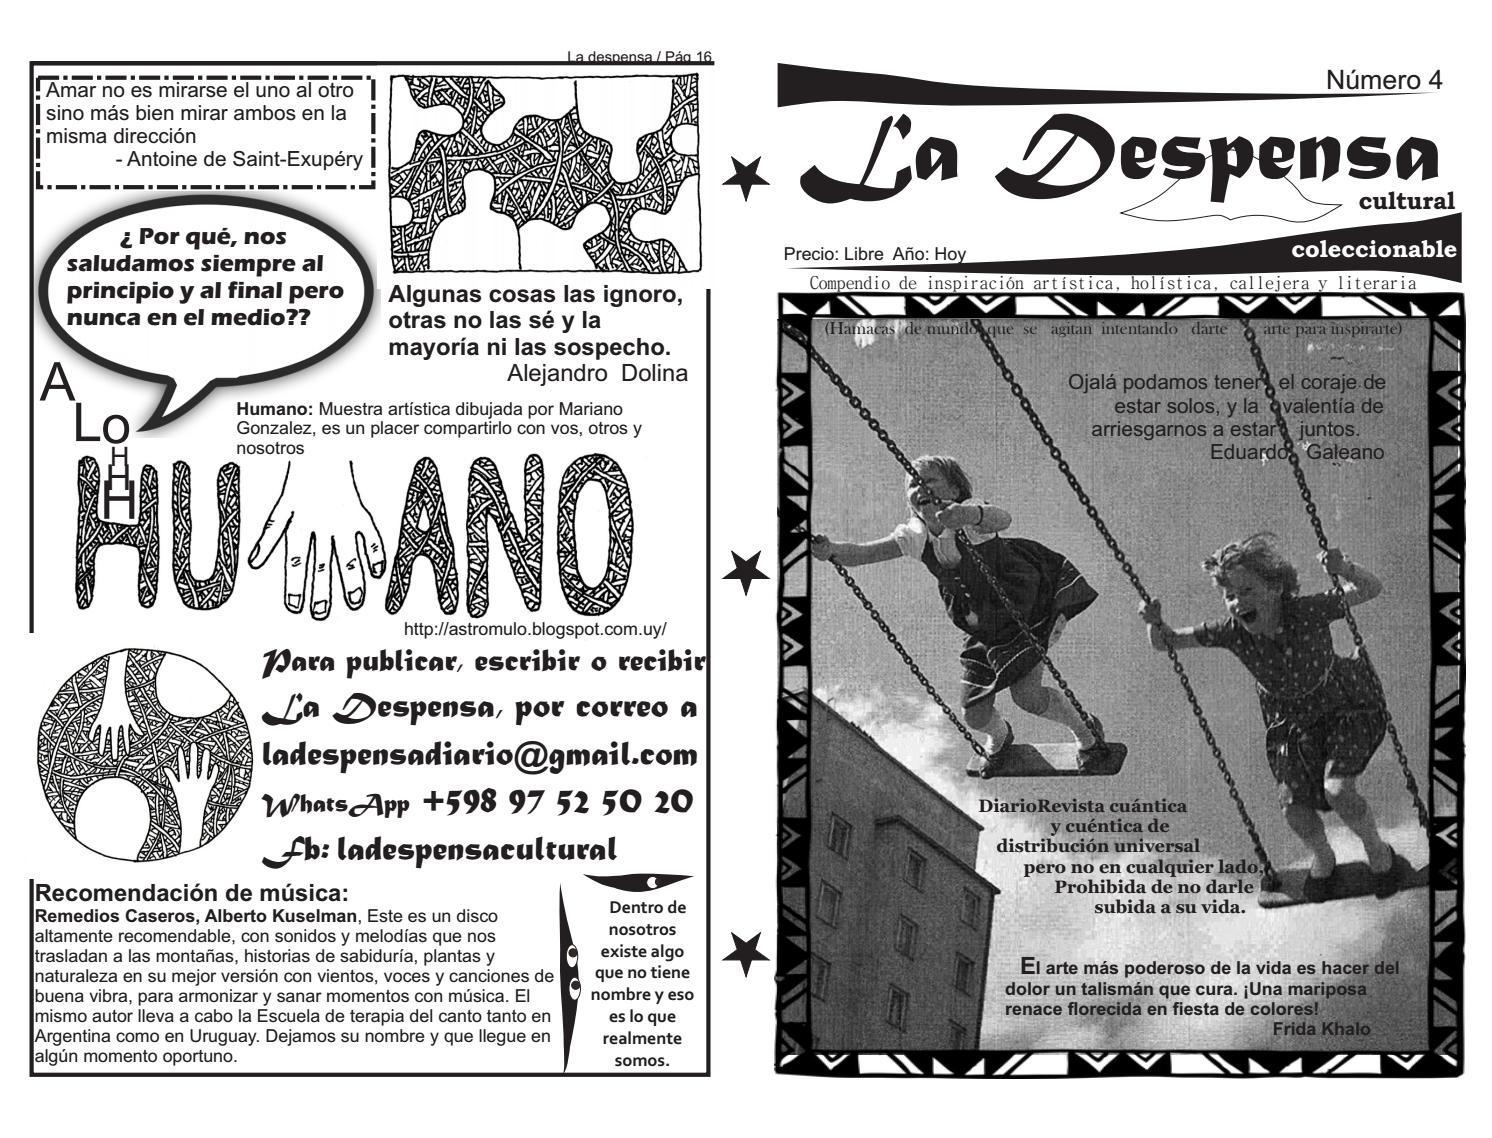 31a6807b9 La despensa N° 4 by ladespensadiario - issuu